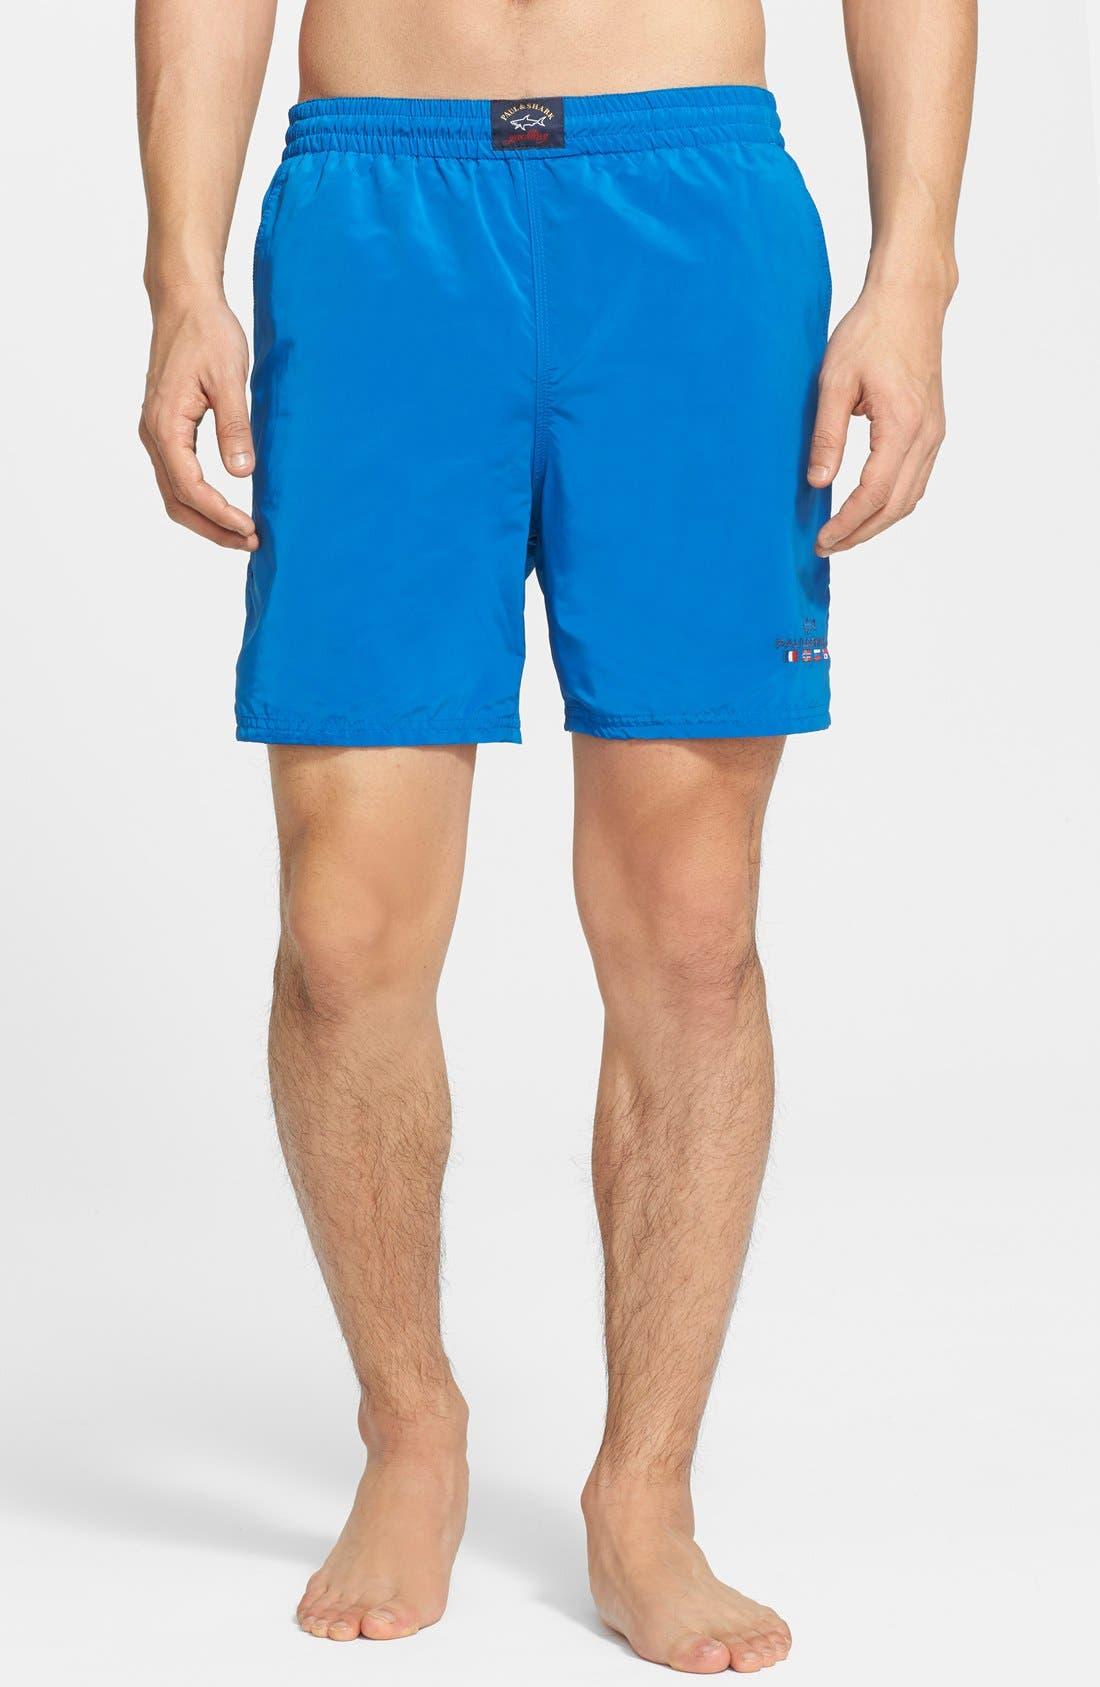 PAUL & SHARK Swim Trunks, Main, color, 420